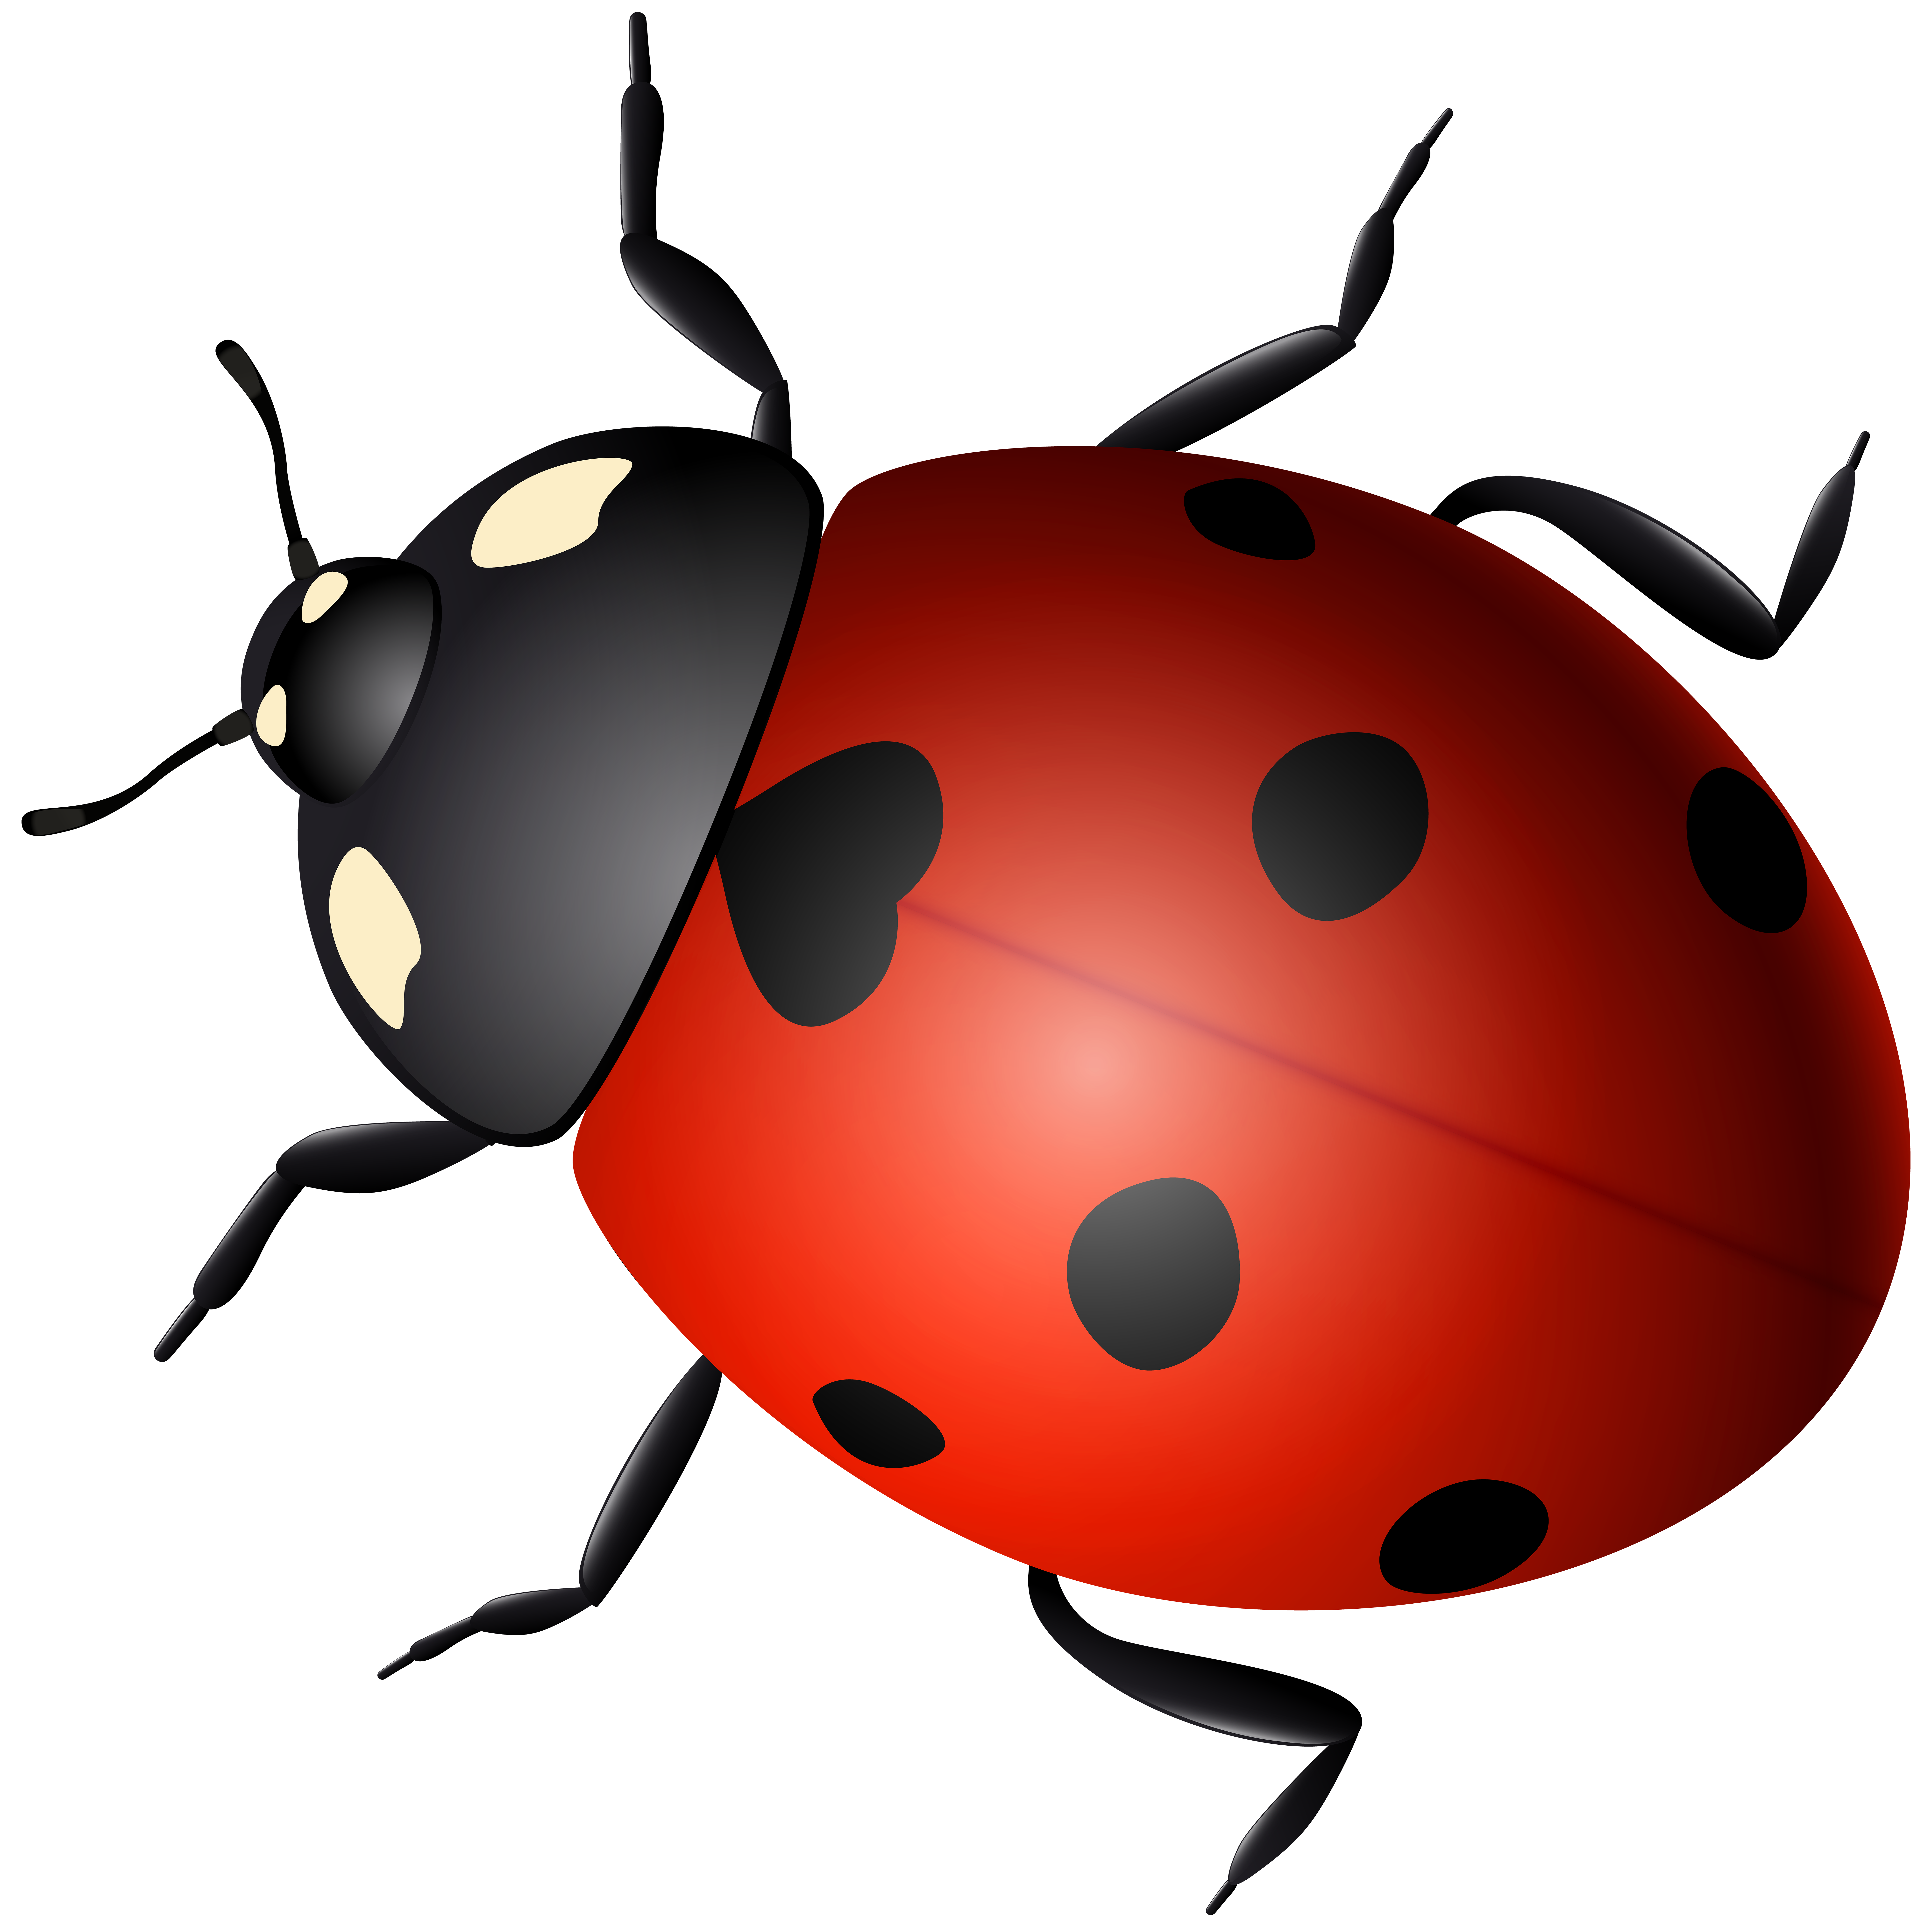 clip art library library Ladybird beetle clip art. Ladybug transparent